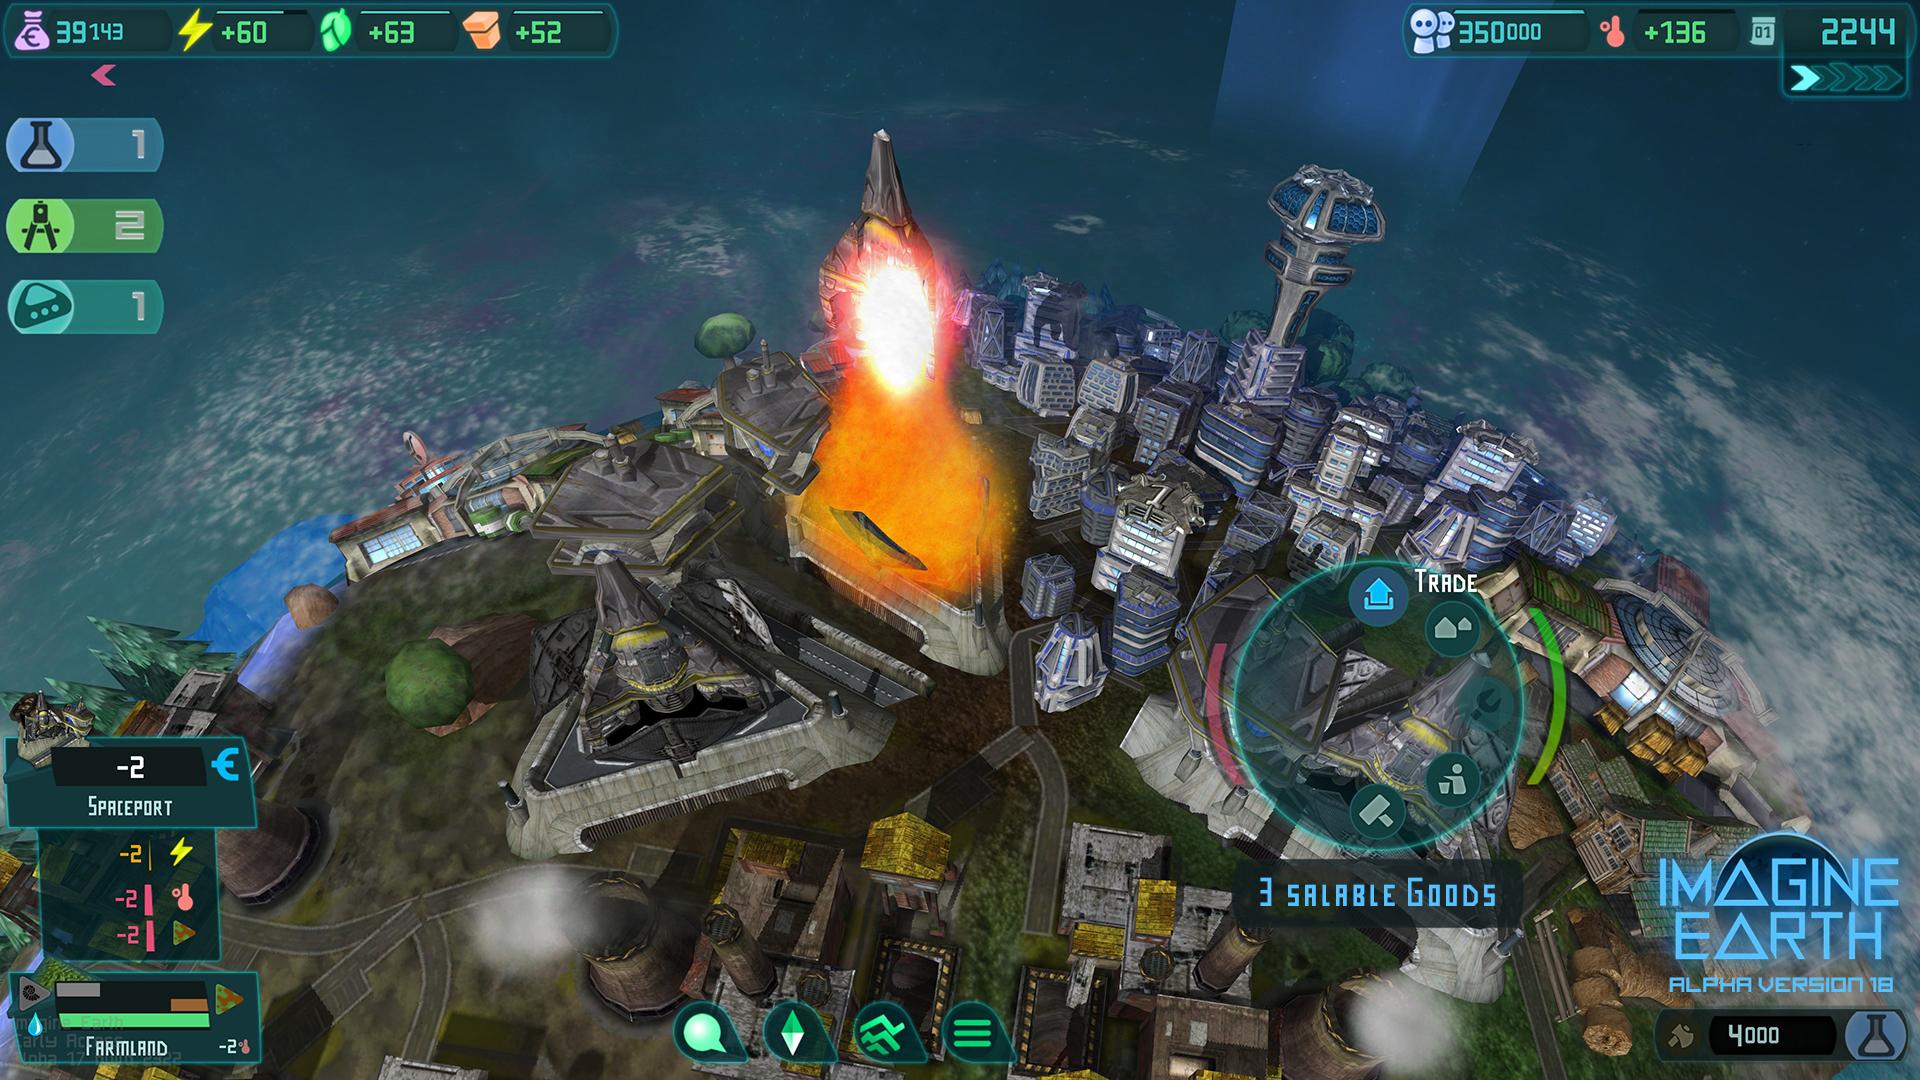 imagine earth game wallpaper 75120